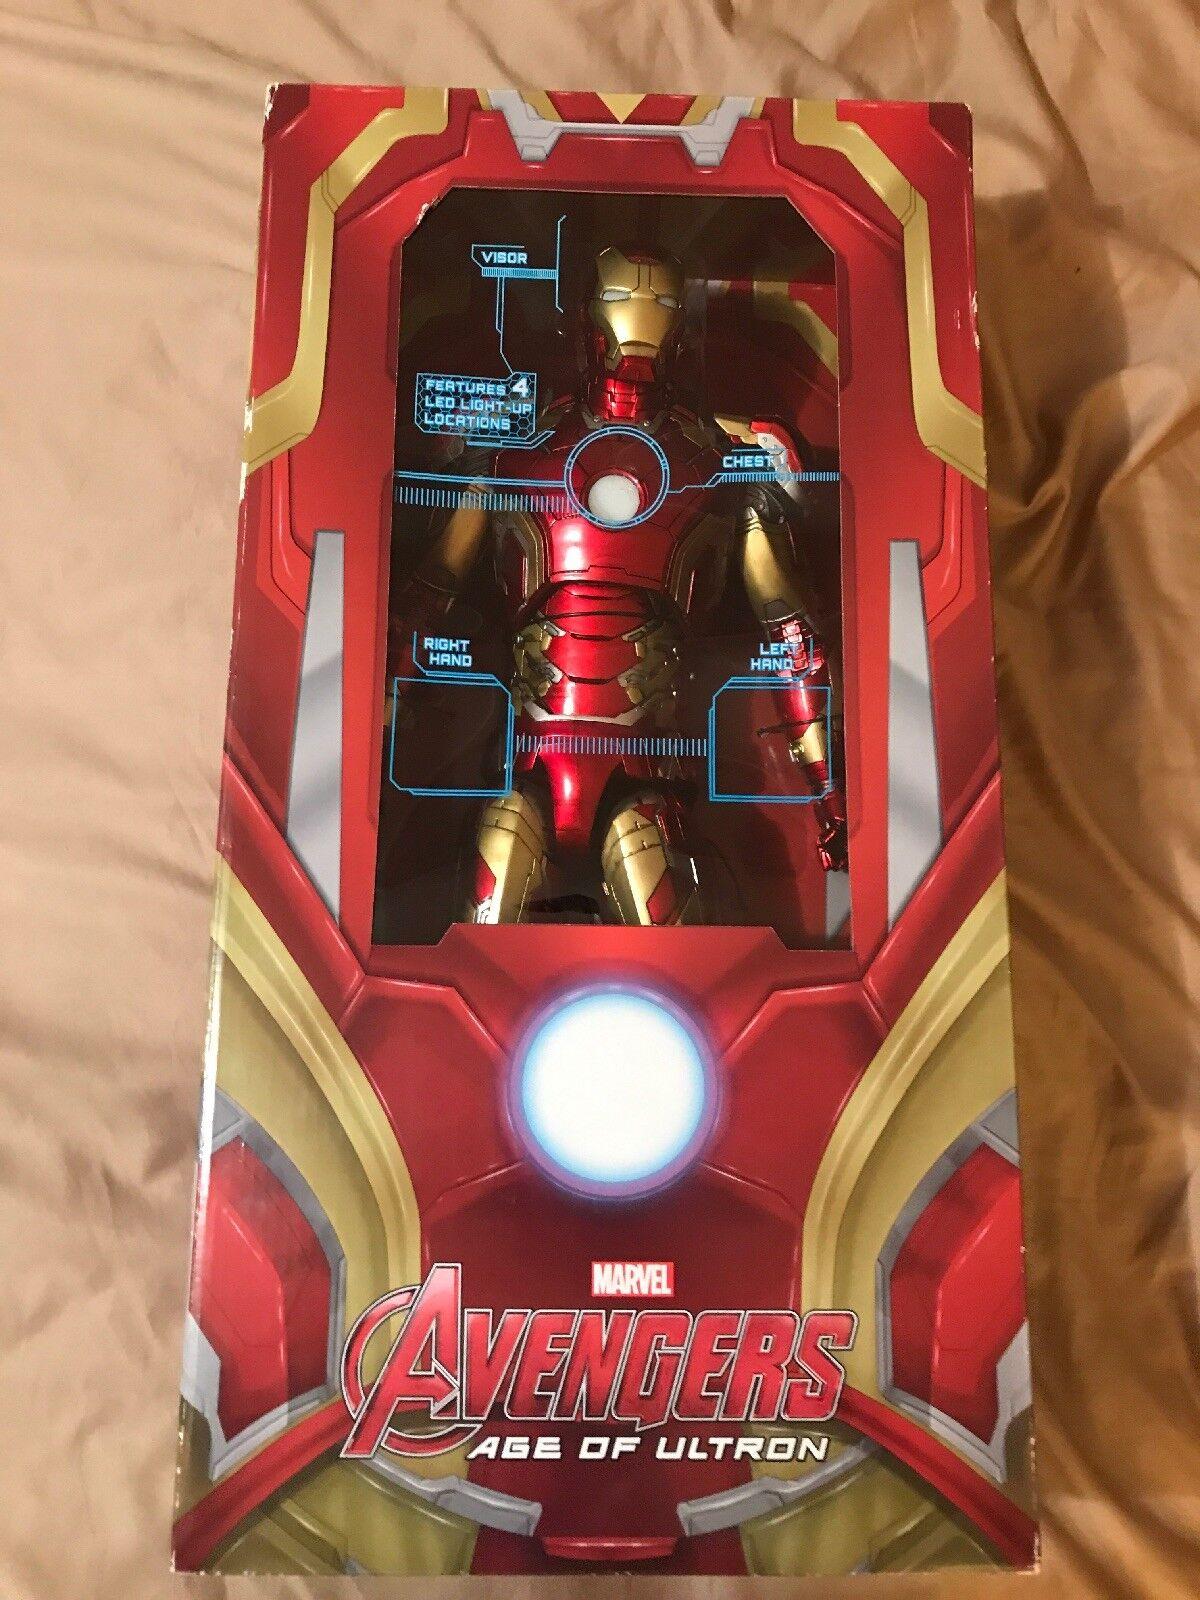 Iron Man Mark 43 Vengadores 2 la Era de Ultron 18 1/4 Escala Figura Neca 2018 LED